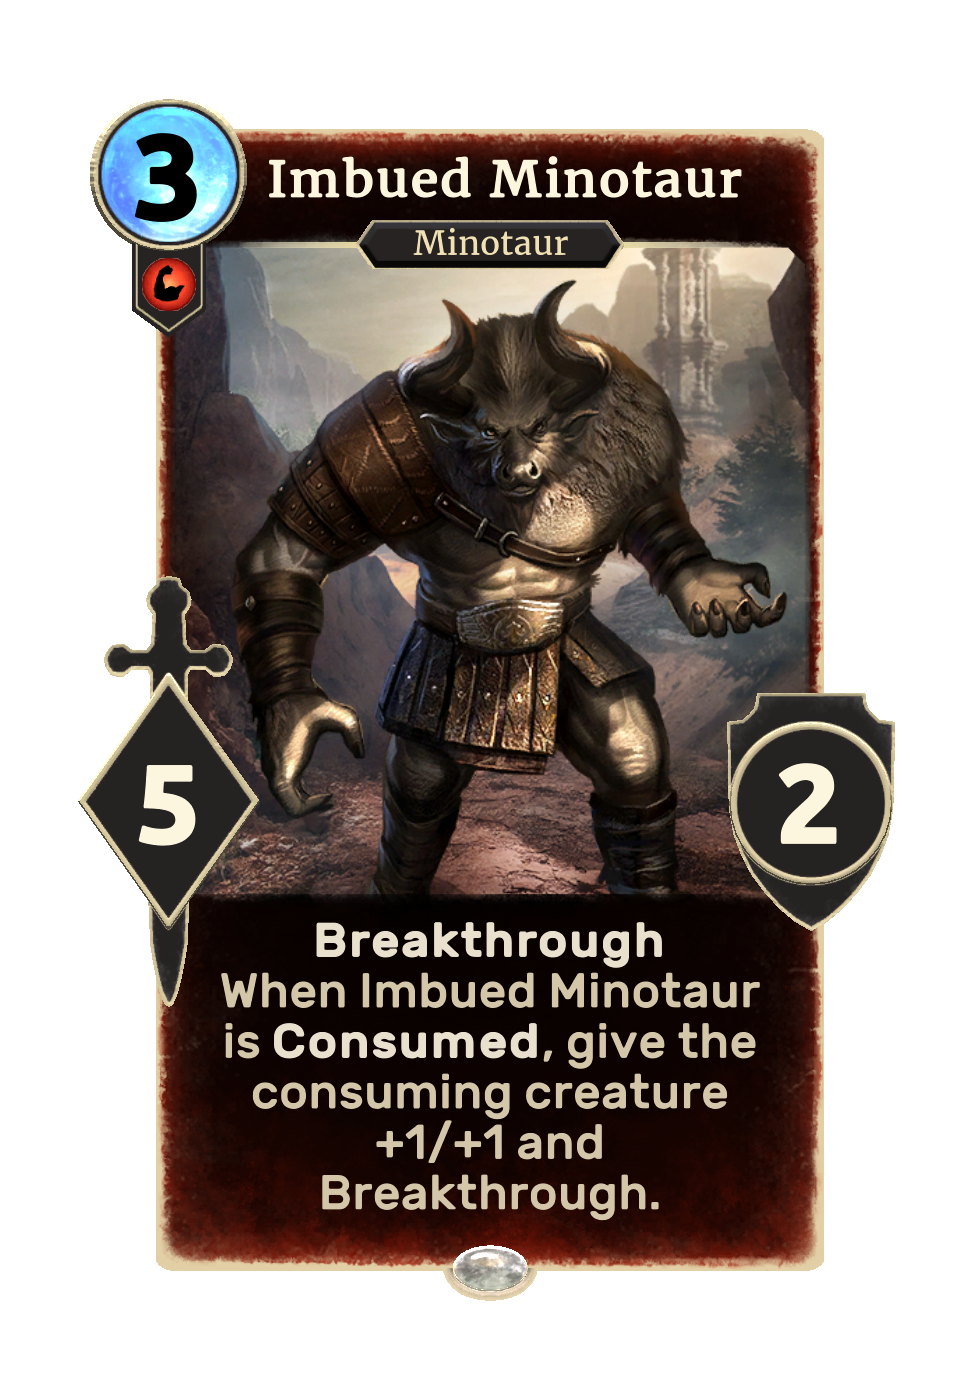 Imbued Minotaur